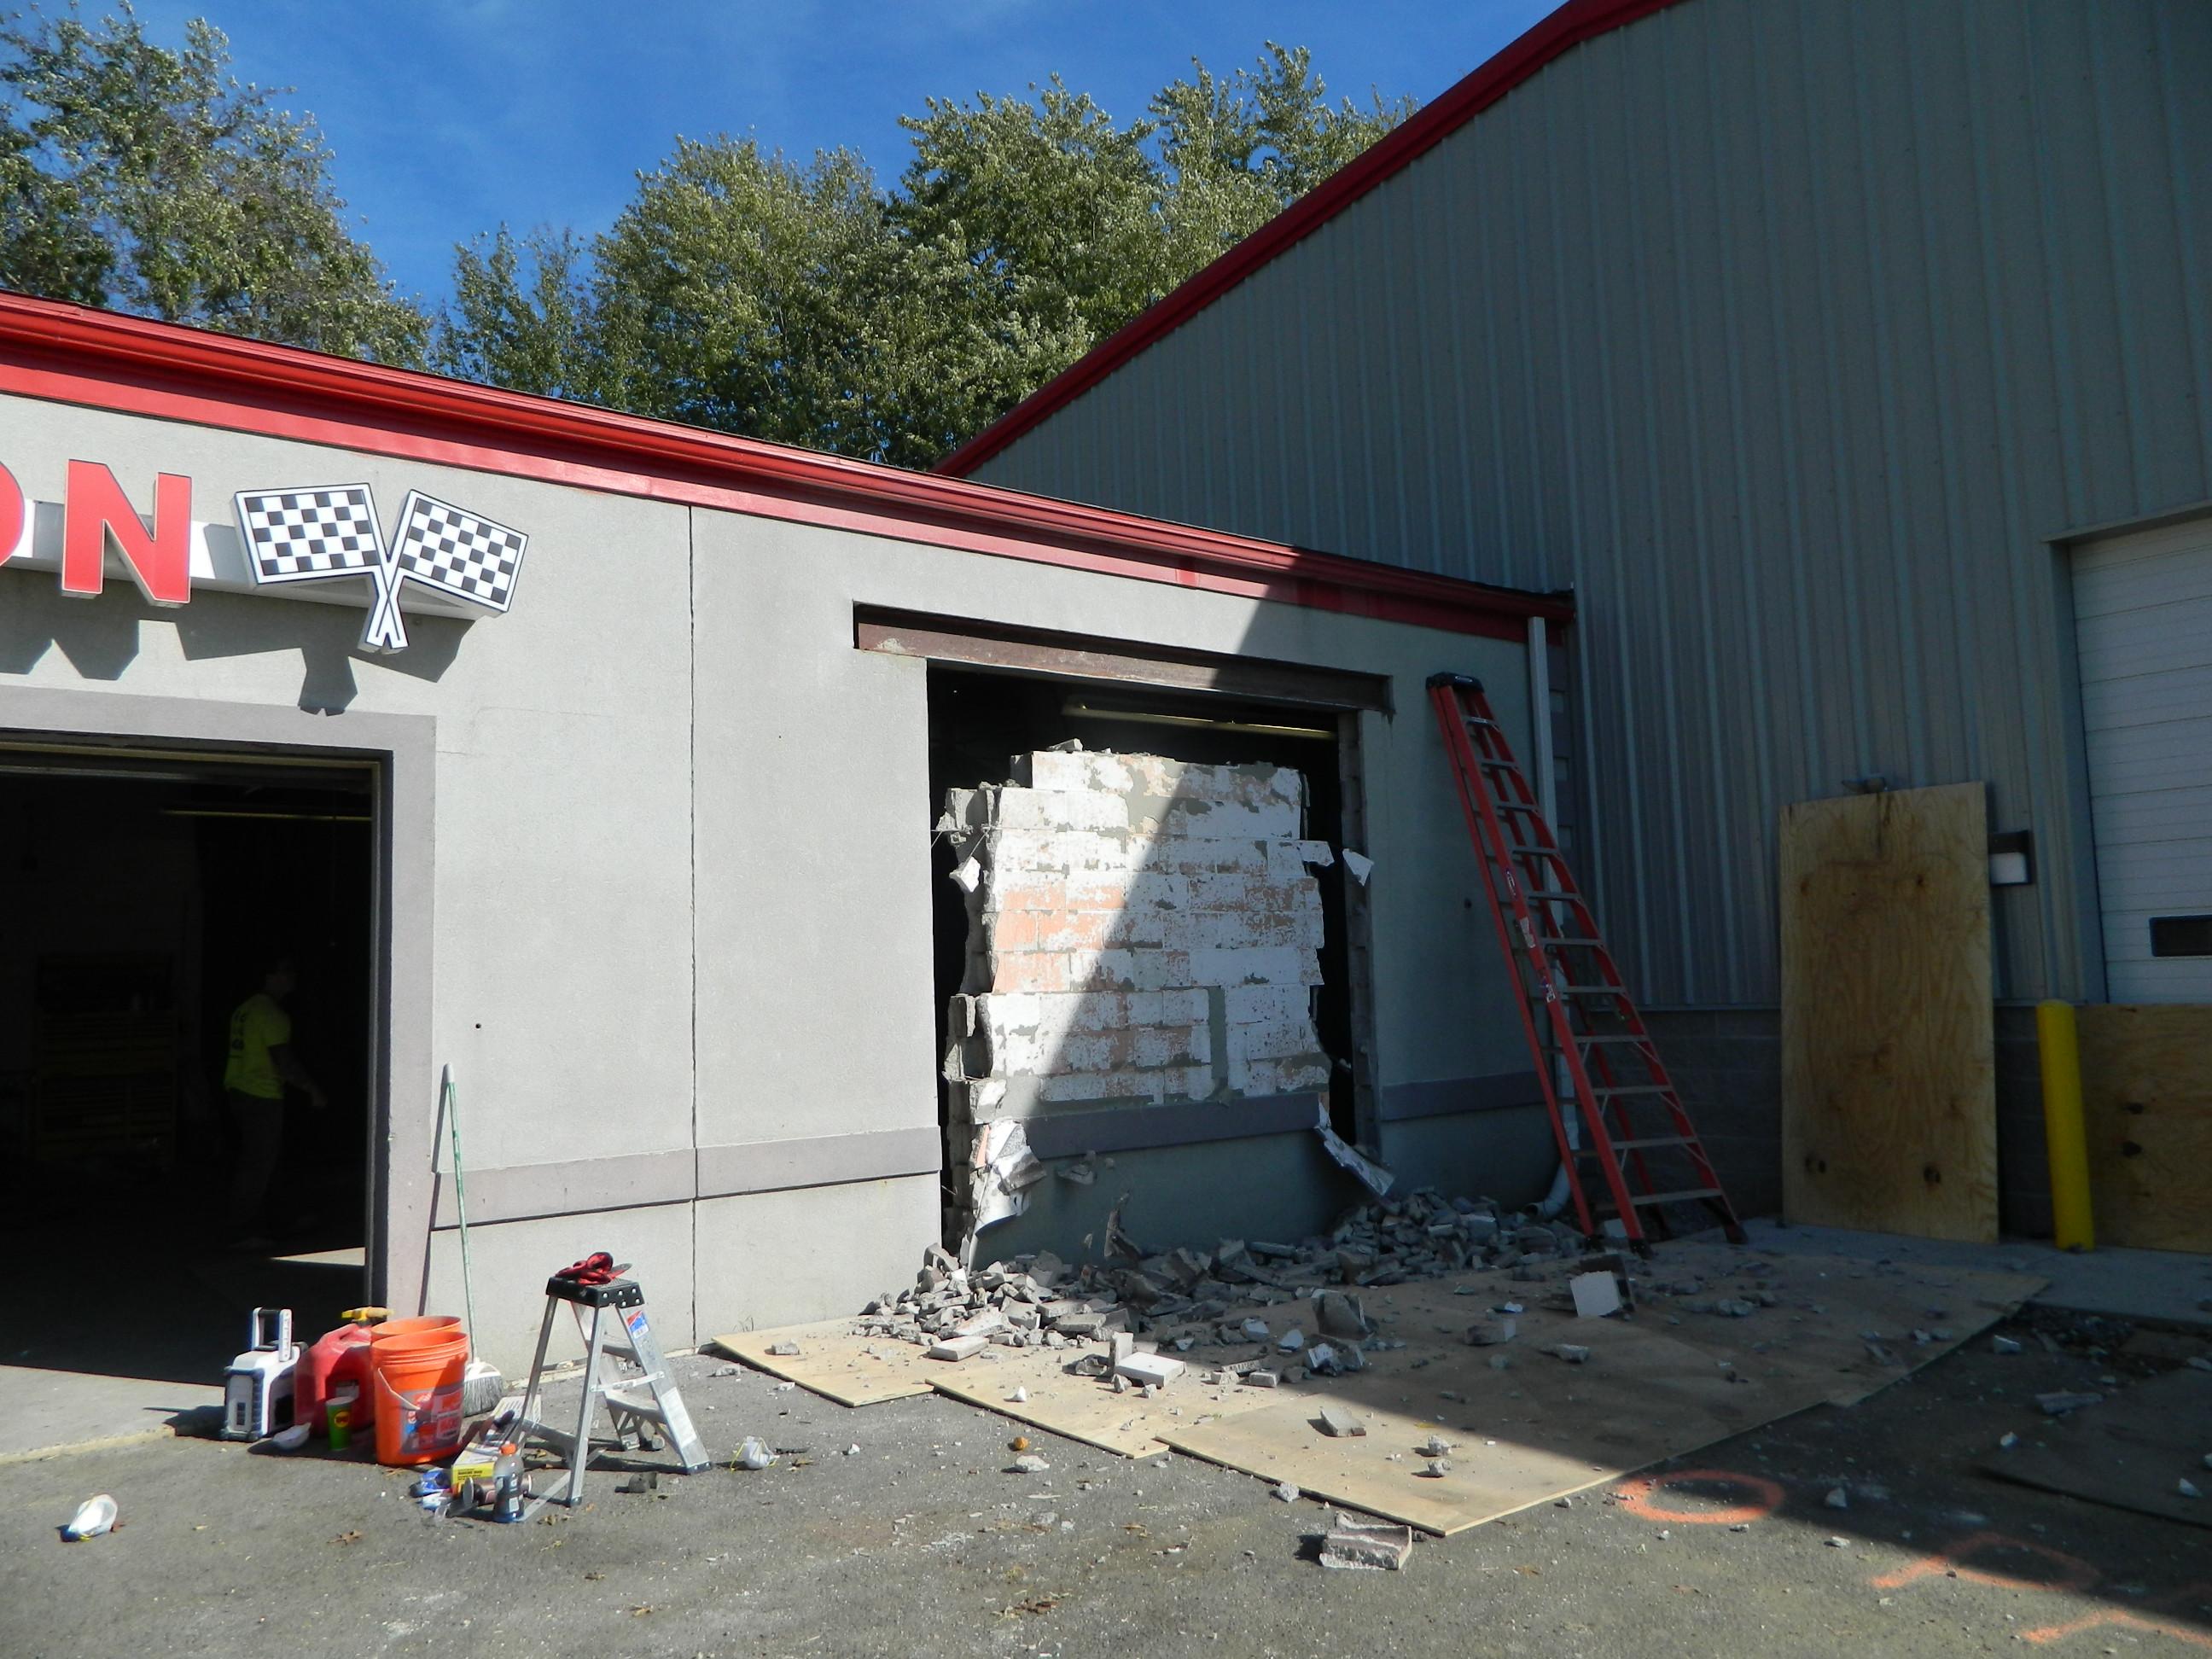 Additional garage bays